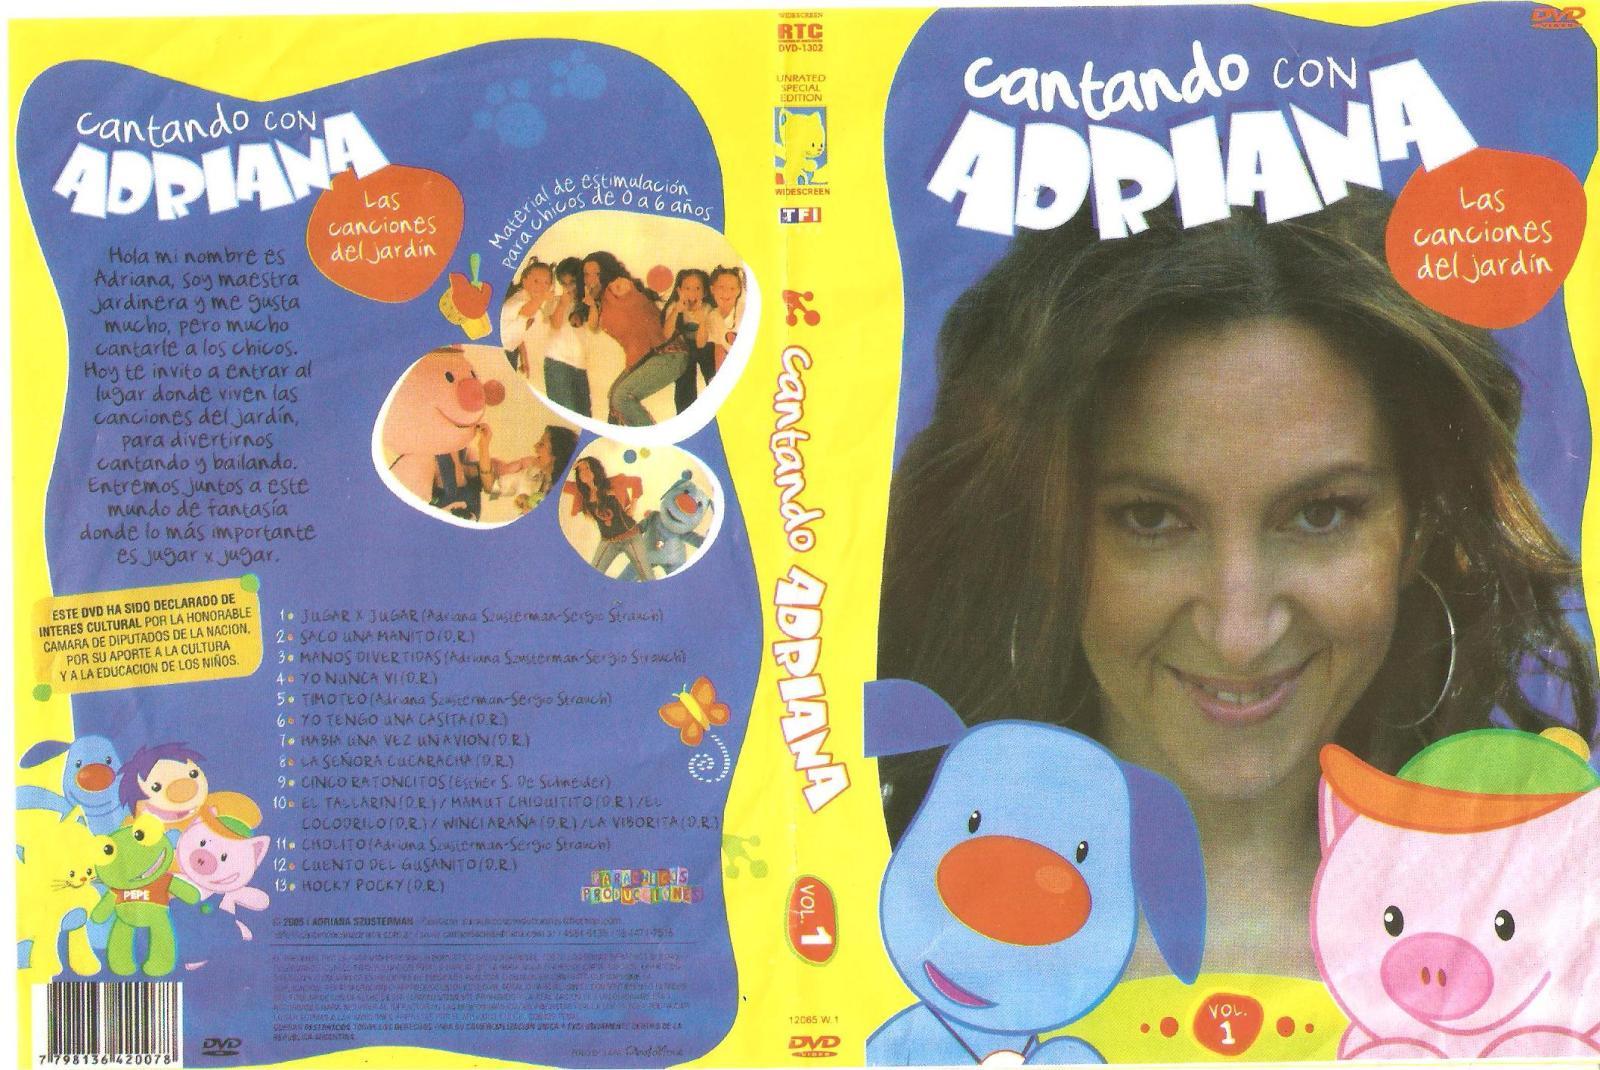 Cantando Con Adriana Dvd Cantando Con Adriana Vol 1